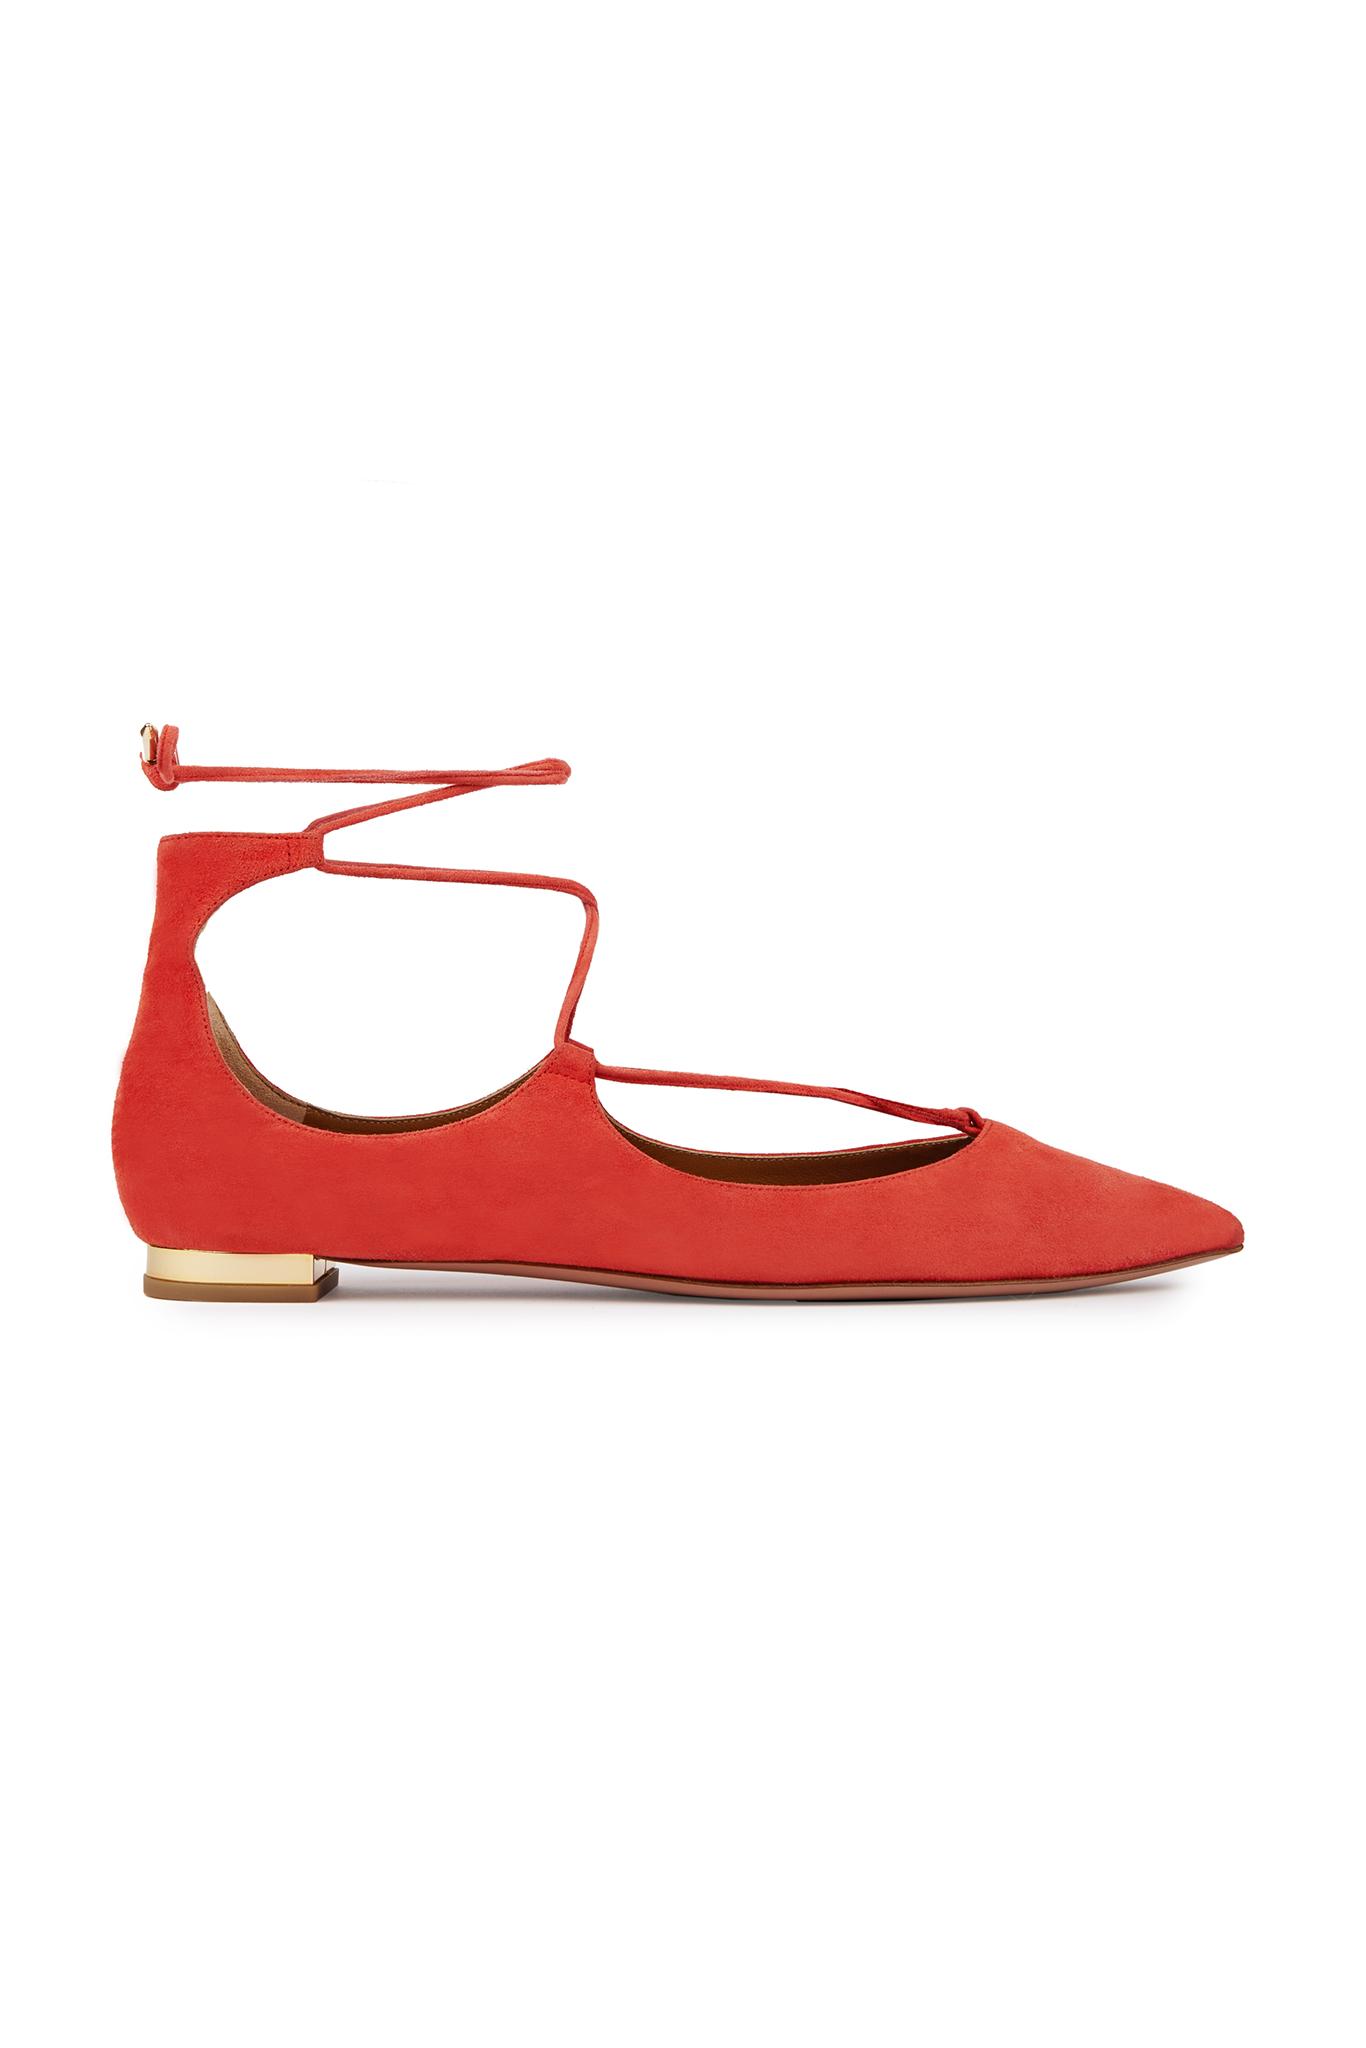 05-02-ankle-strap-flats.jpg